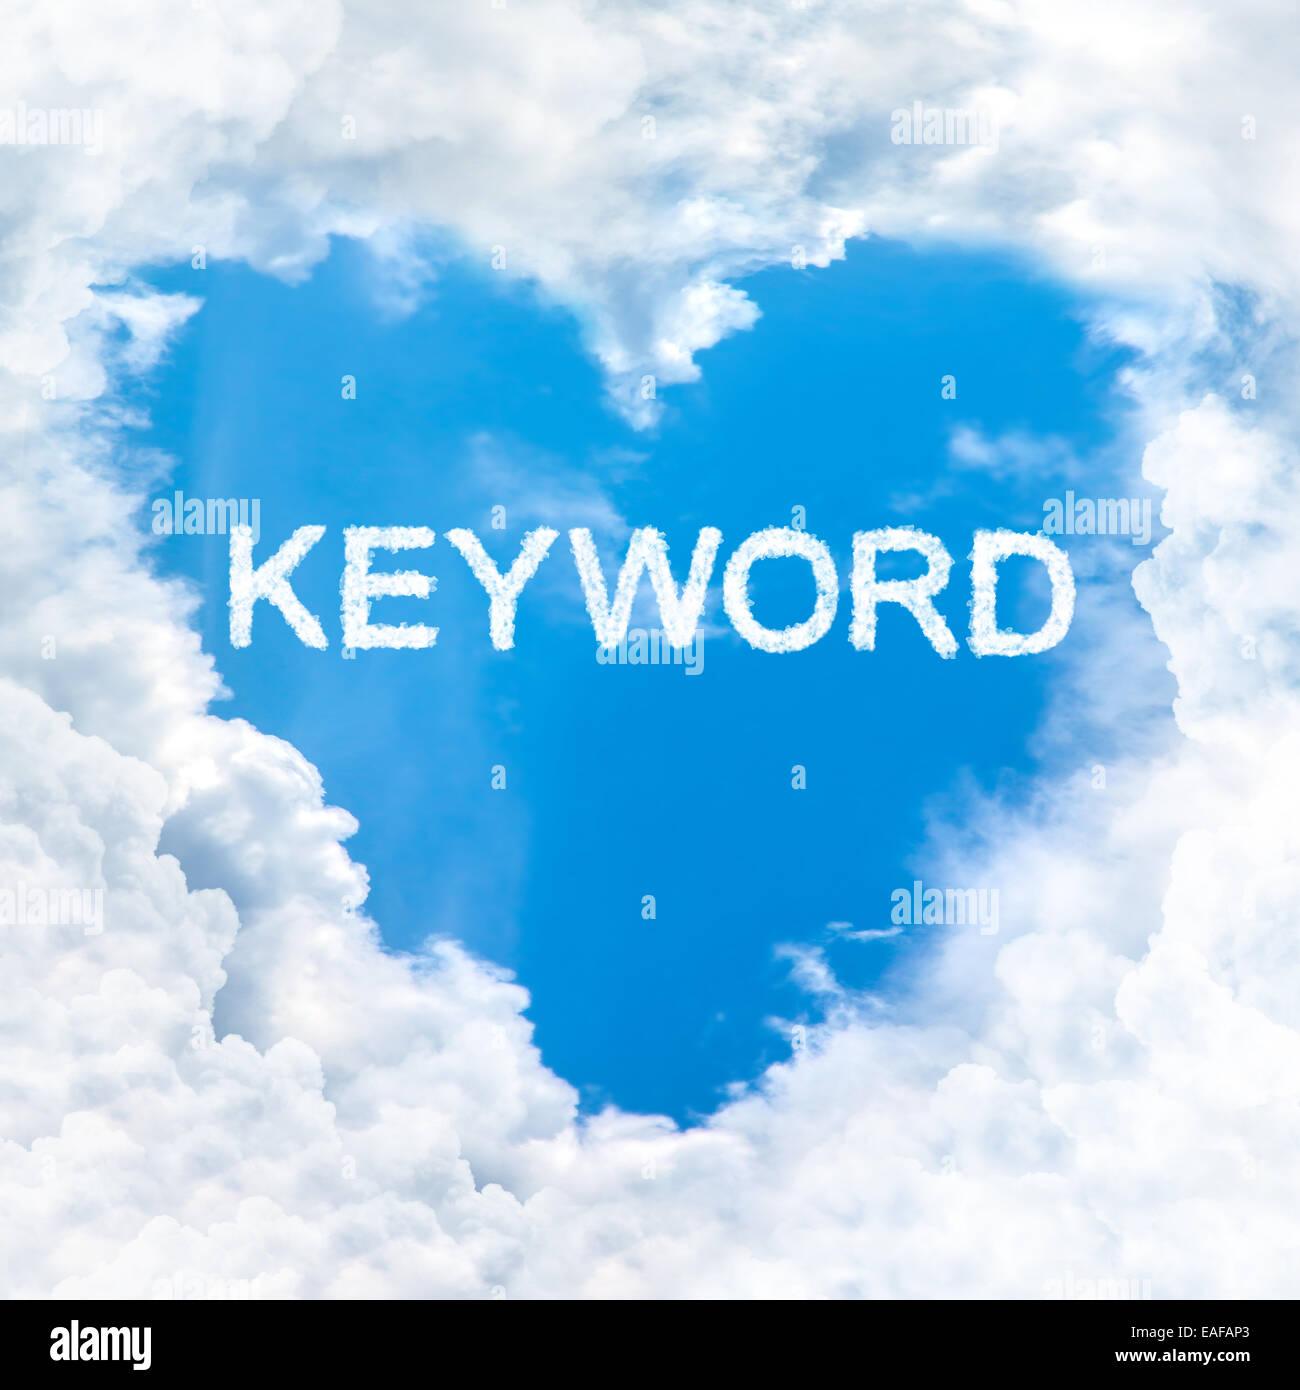 keyword word inside love cloud heart shape blue sky background only - Stock Image